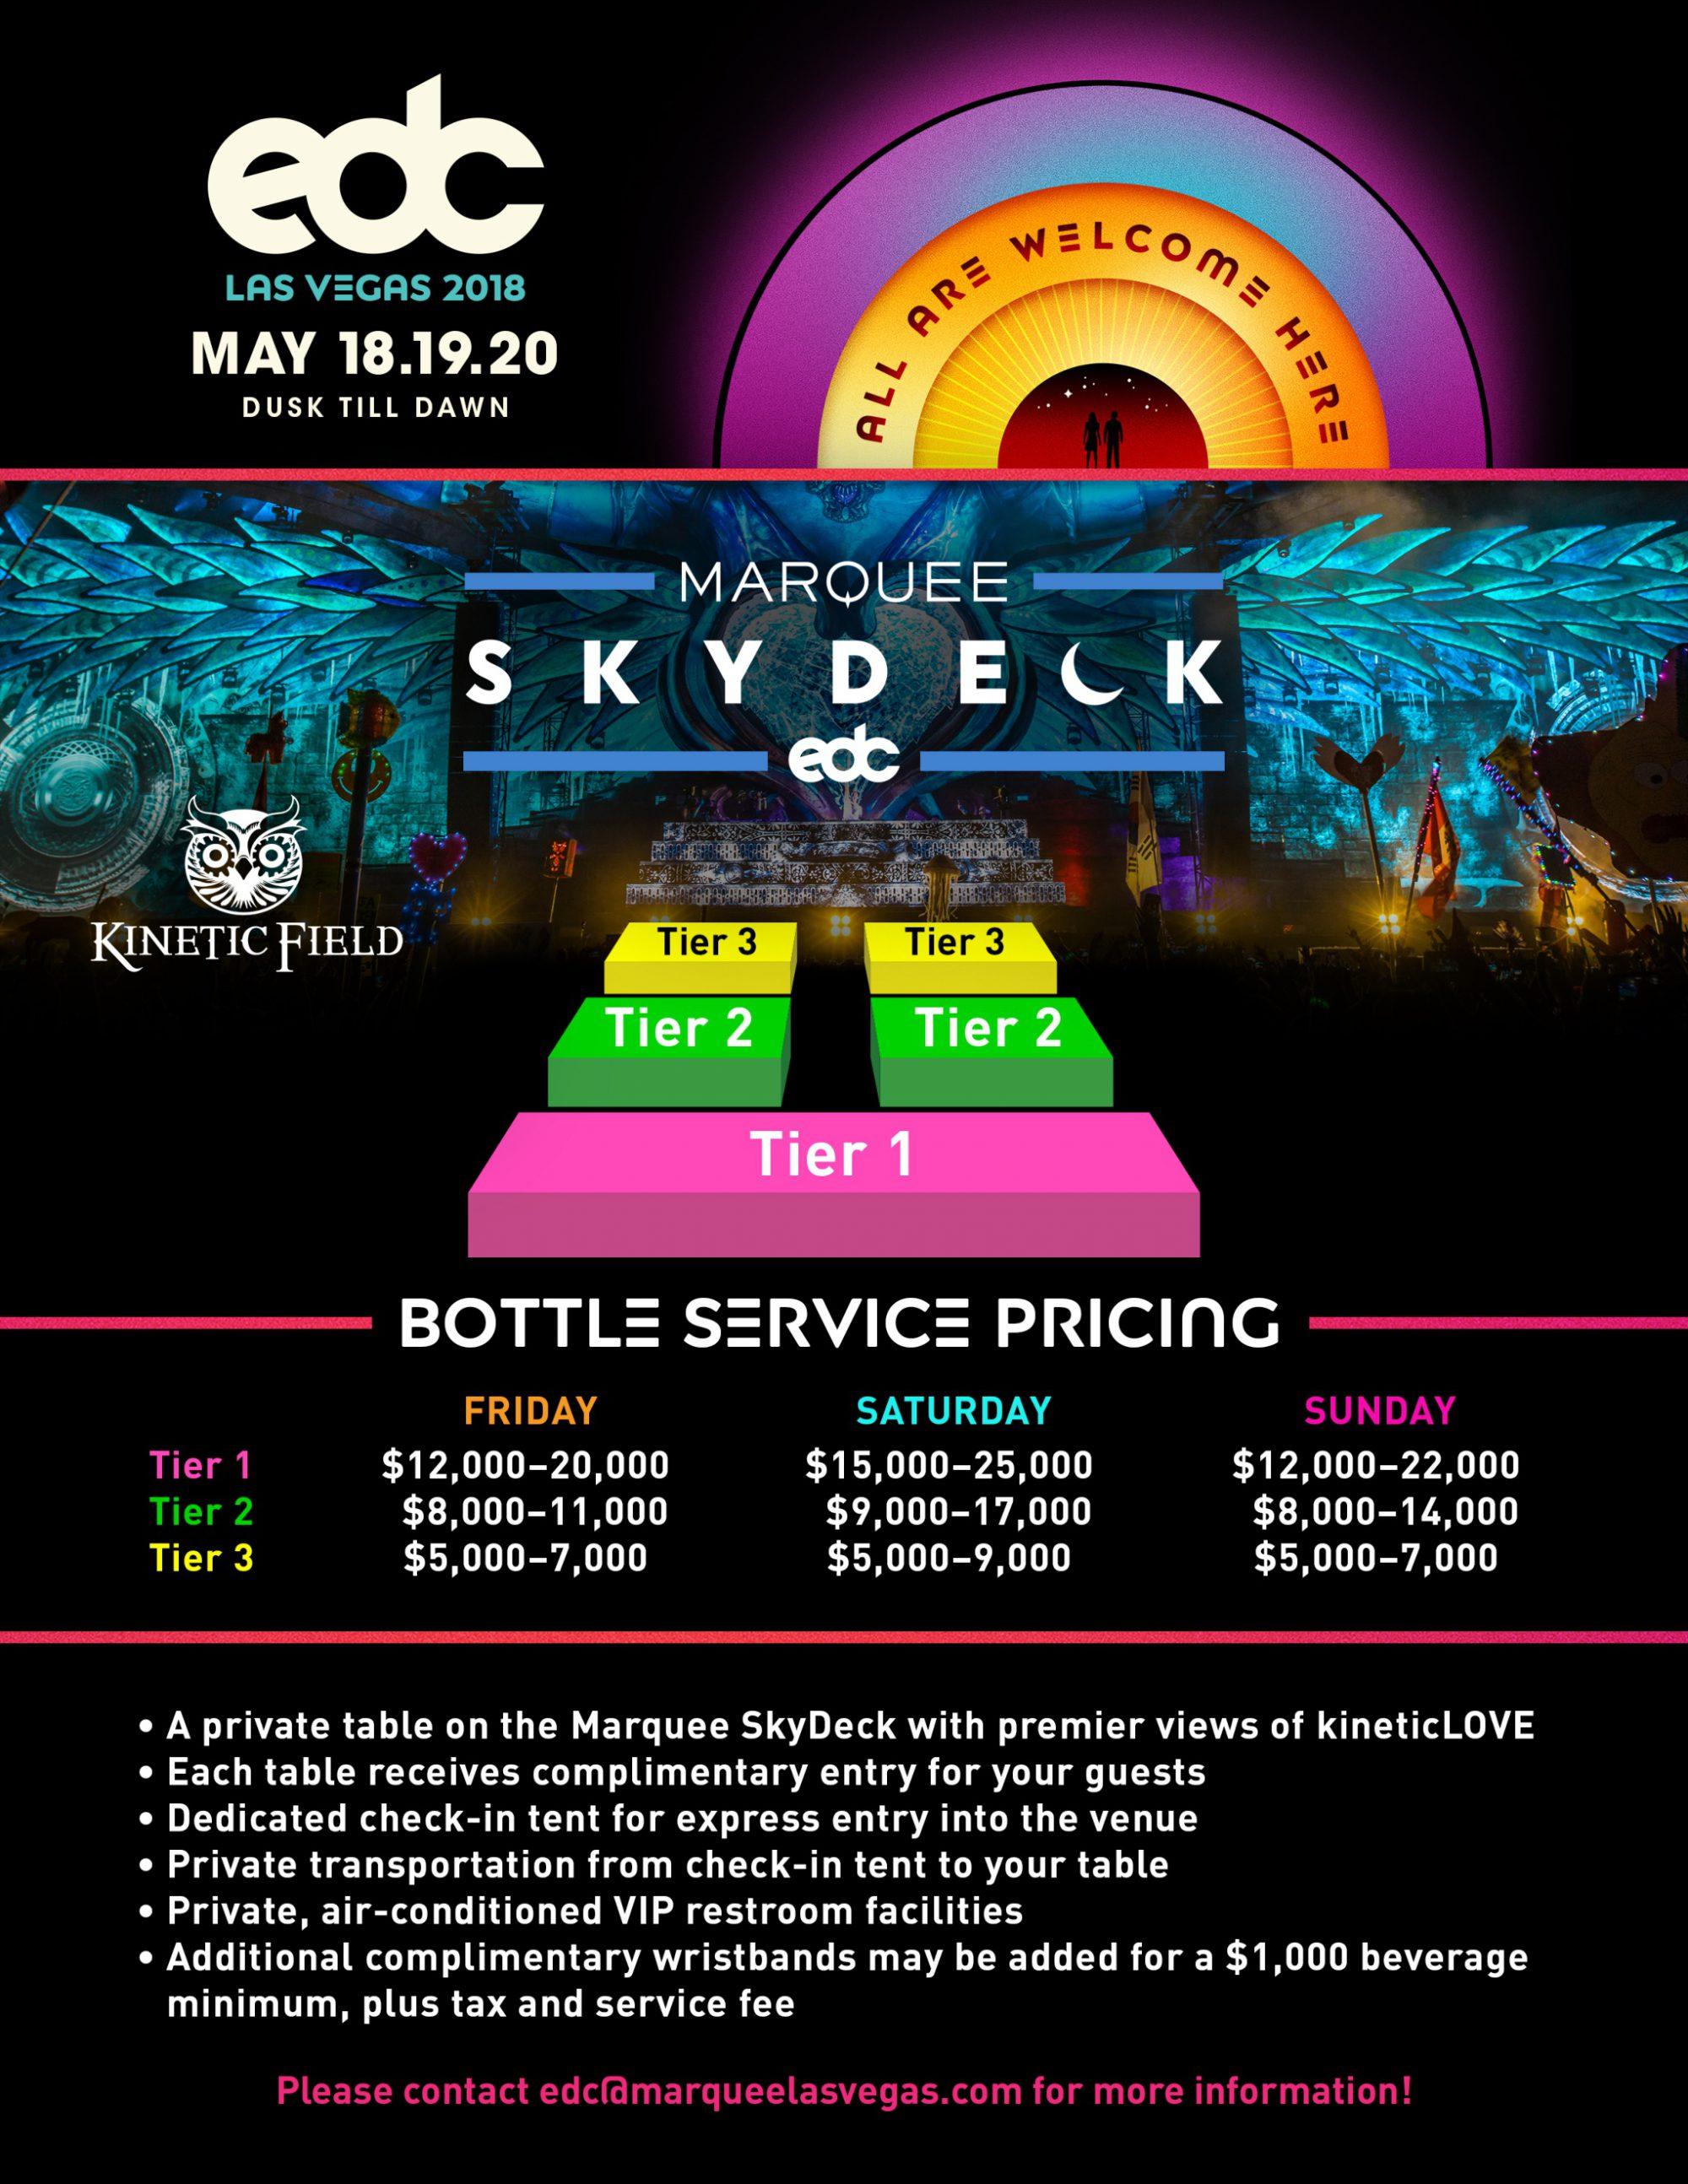 Marquee SkyDeck EDC Las Vegas 2018